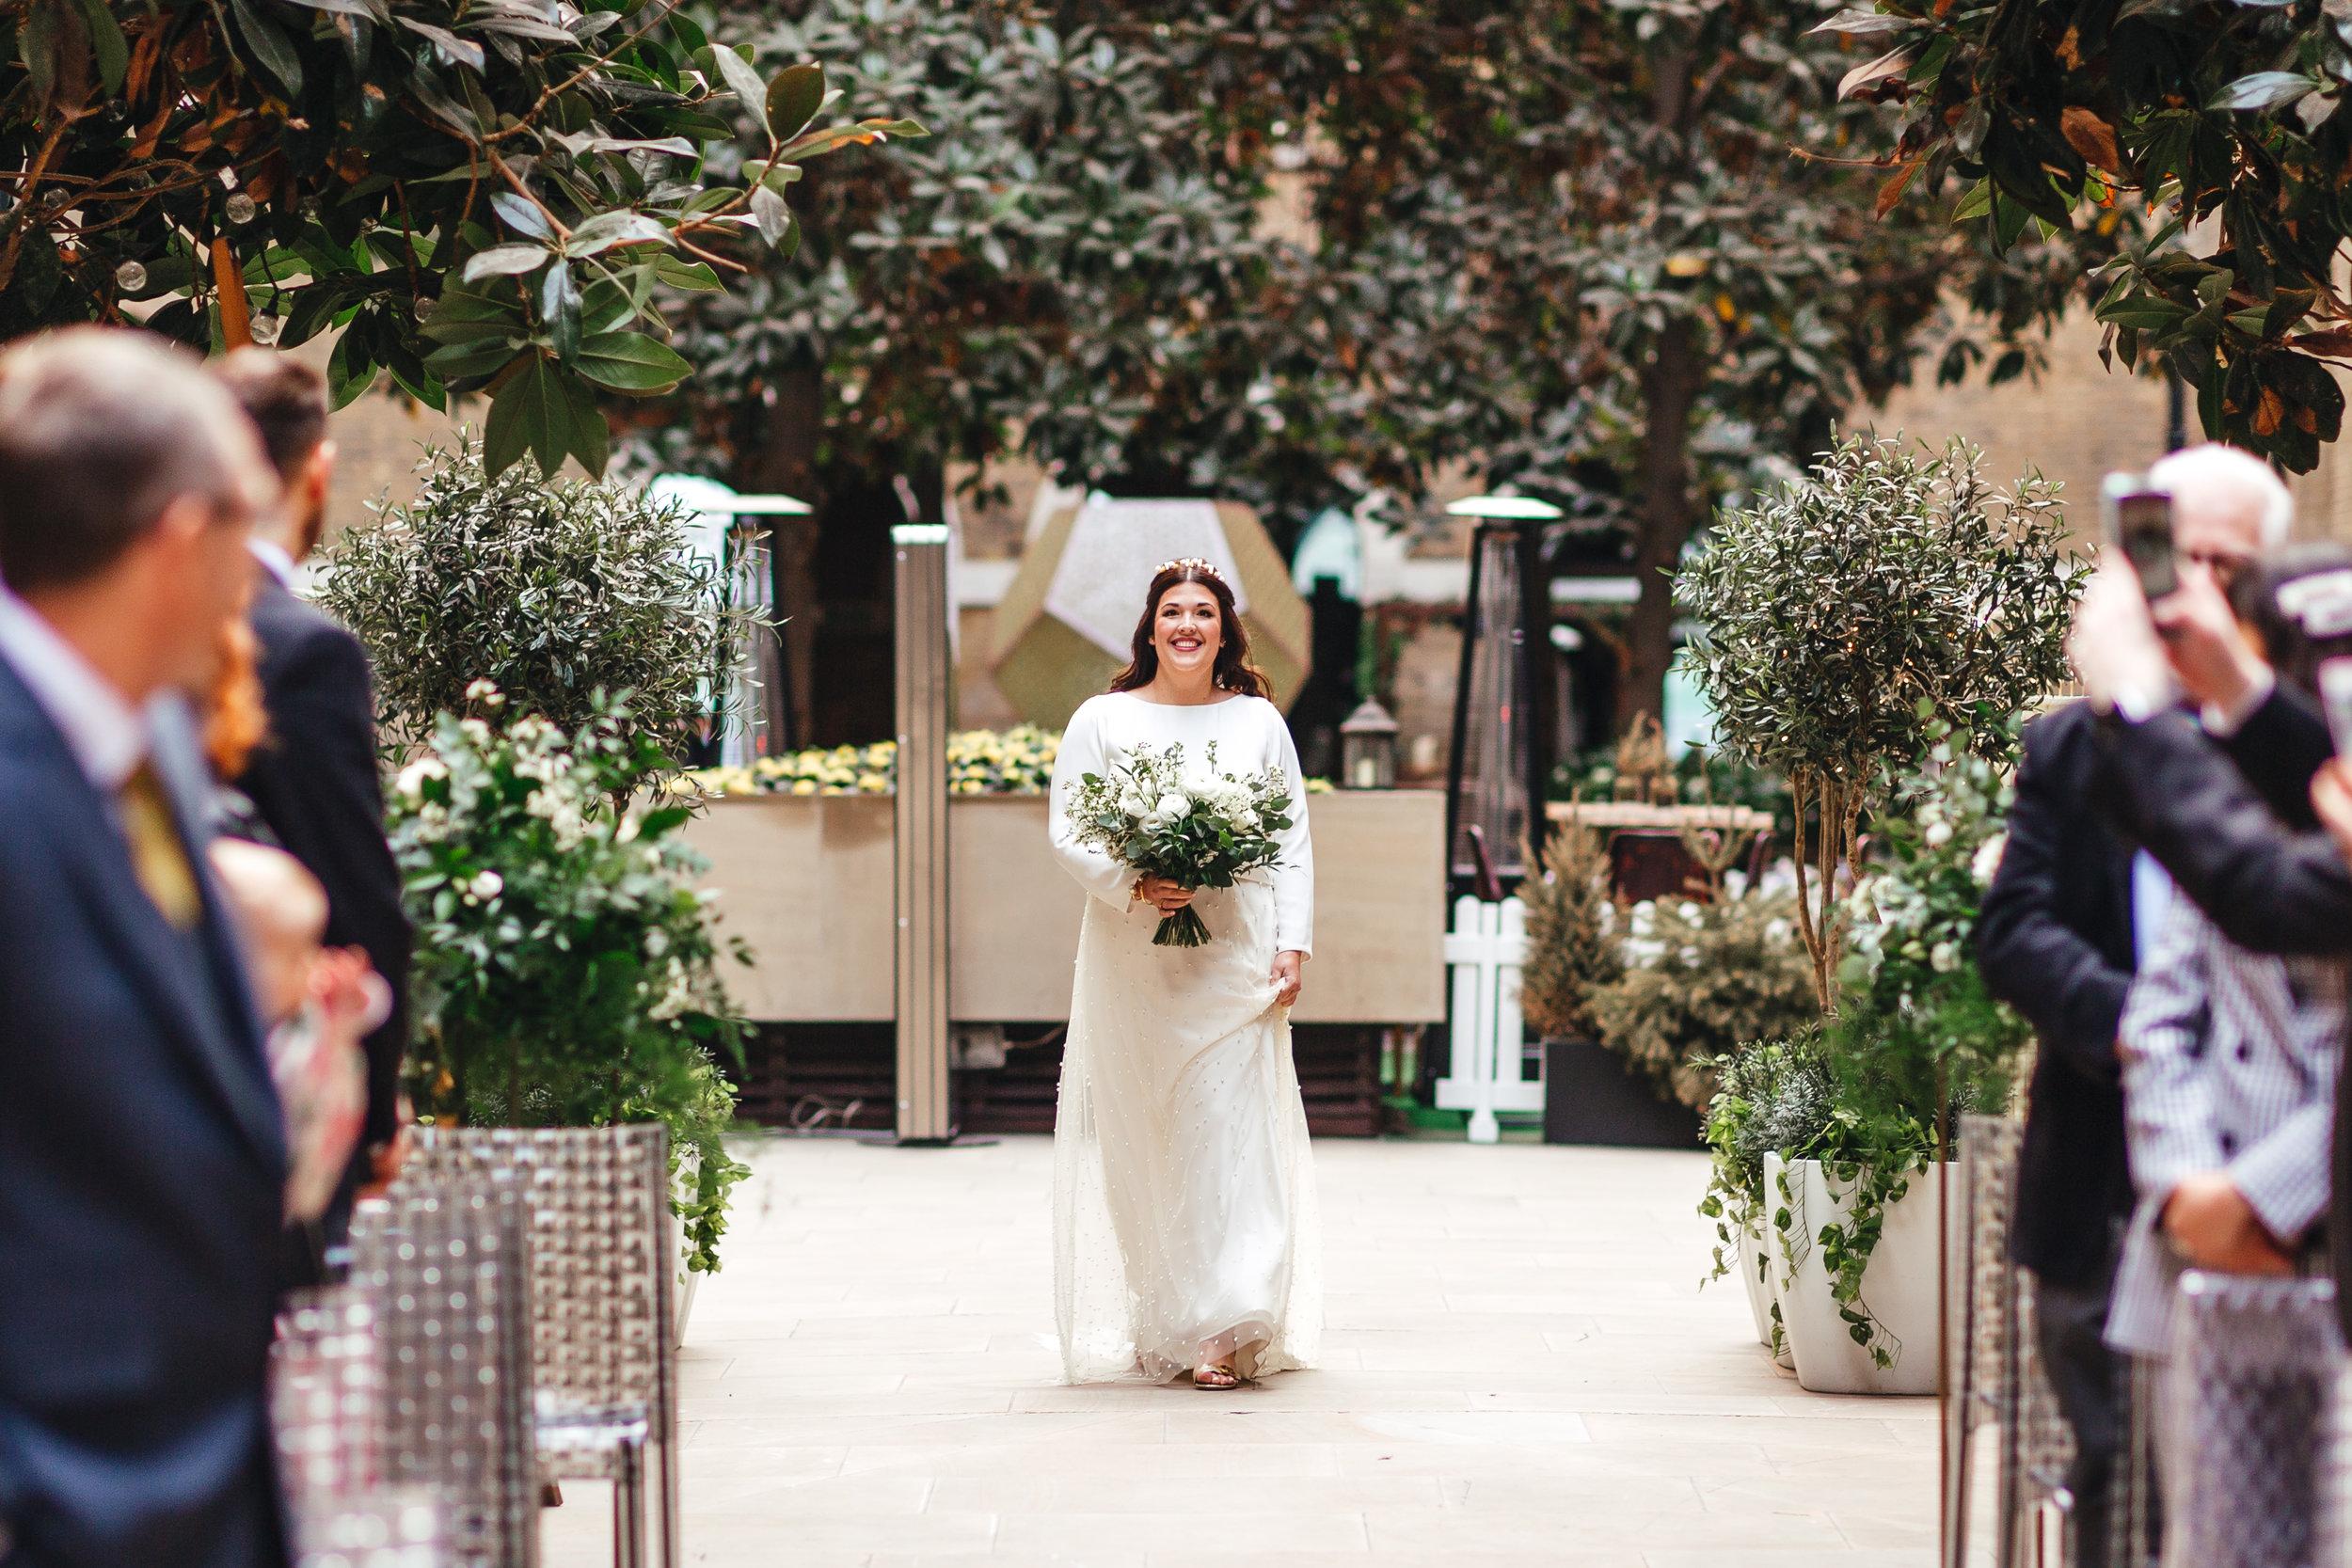 Beautiful bride Sarah wore a wedding dress by Halfpenny London